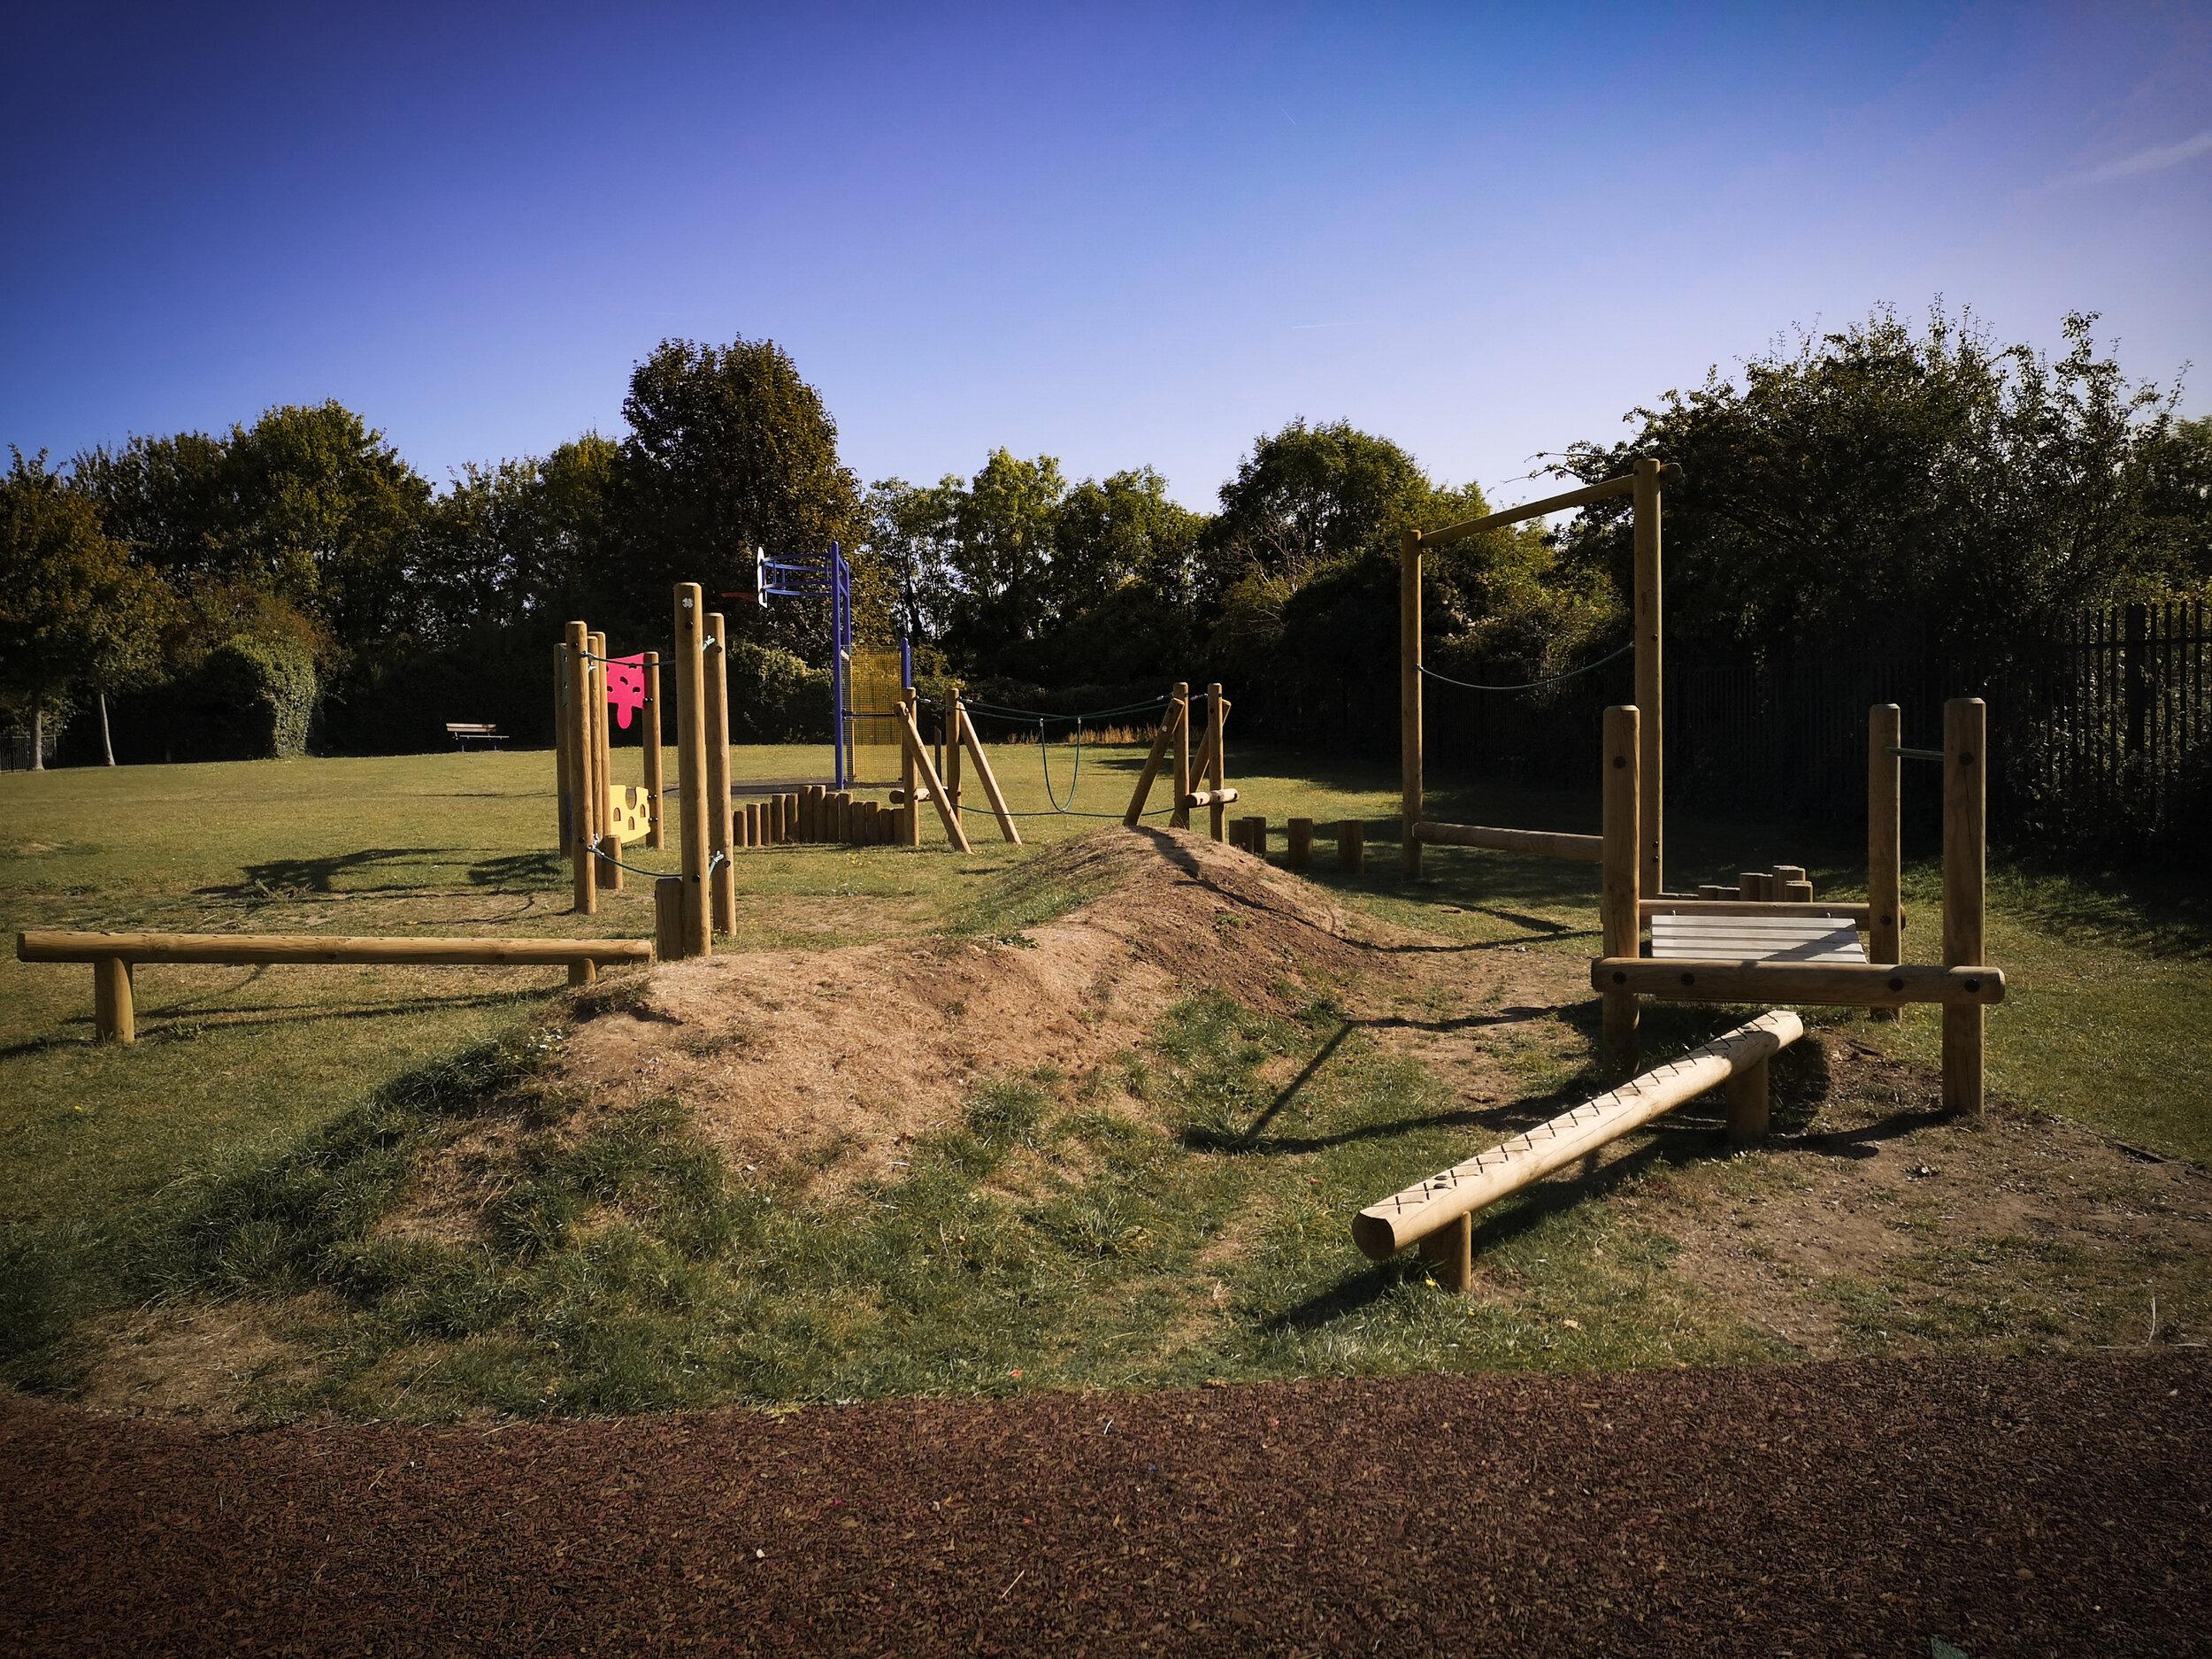 Highcliffe Playground is fun for older children too